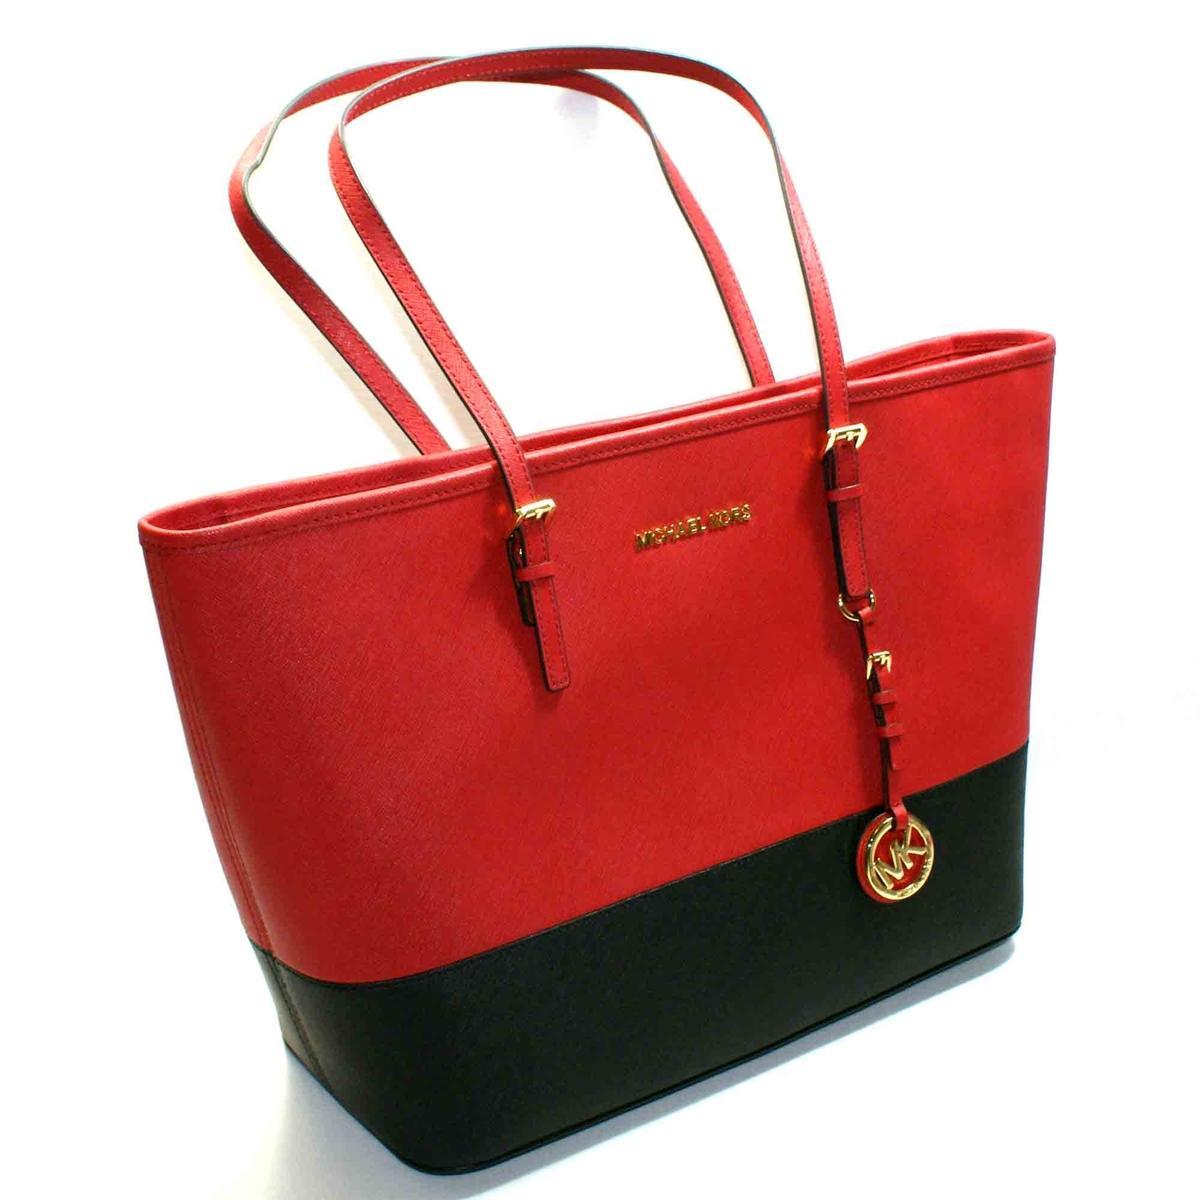 Michael Kors Jet Set Travel Leather Tote Red/ Black